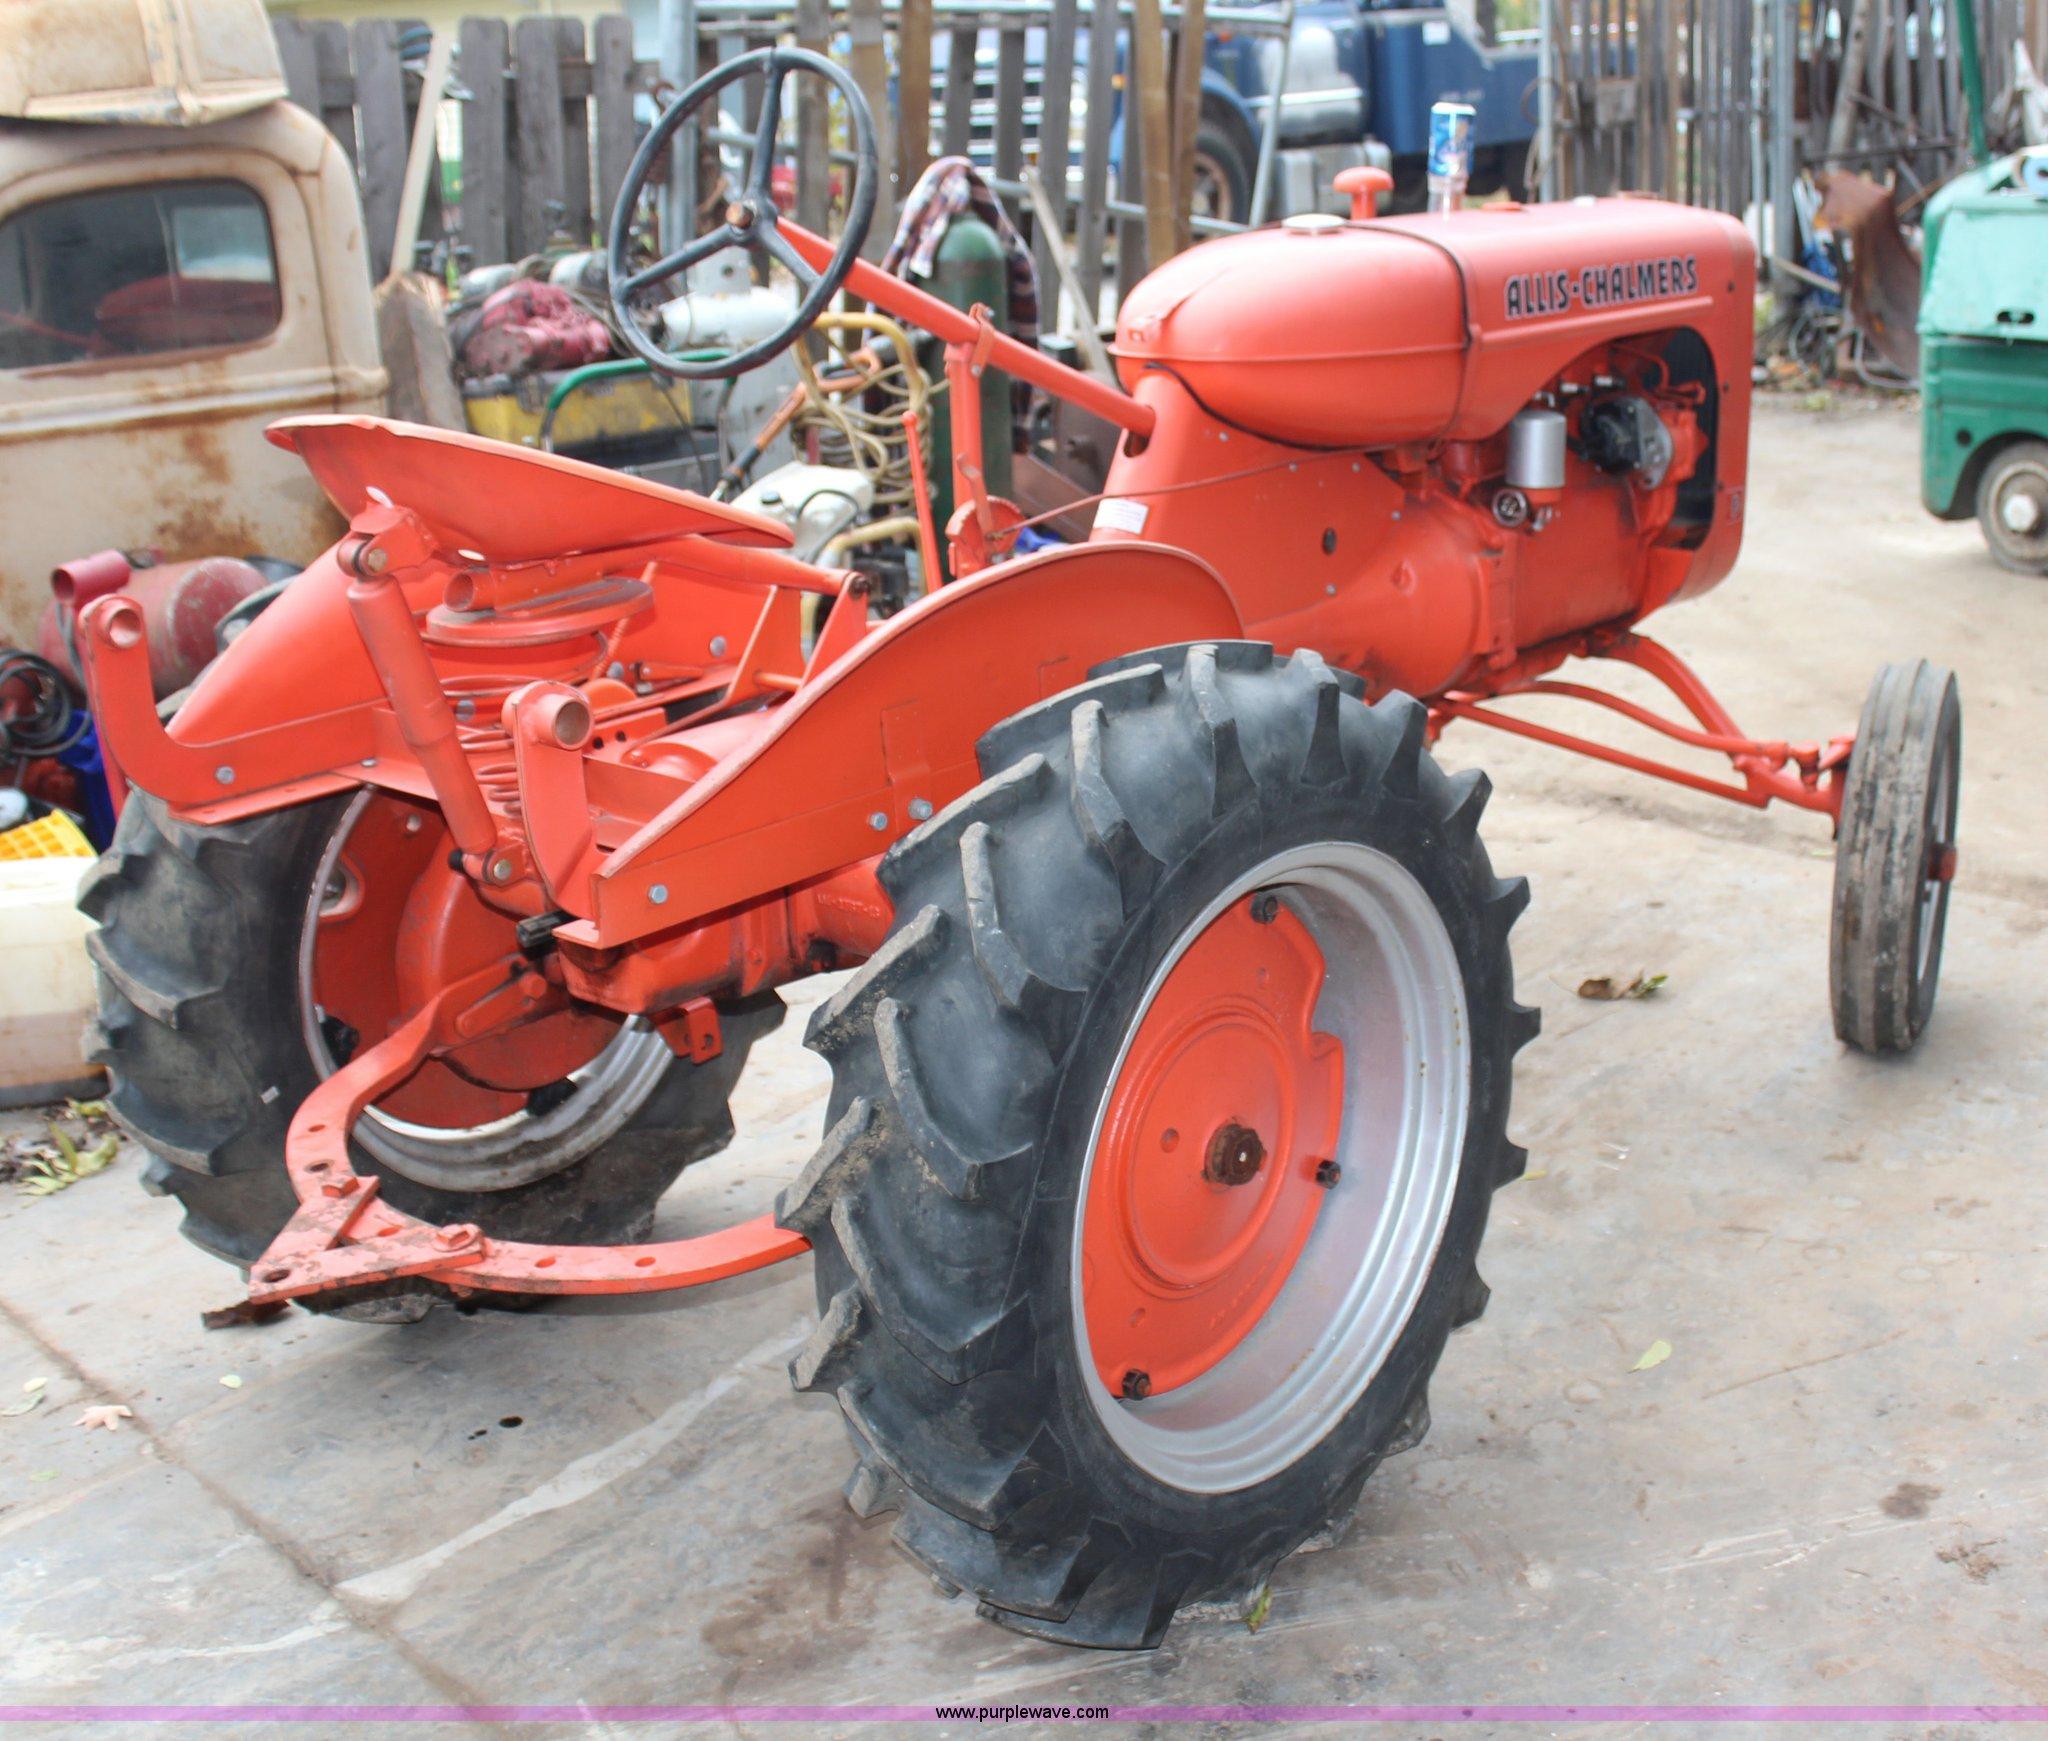 1940 Allis Chalmers B tractor | Item H7950 | SOLD! November